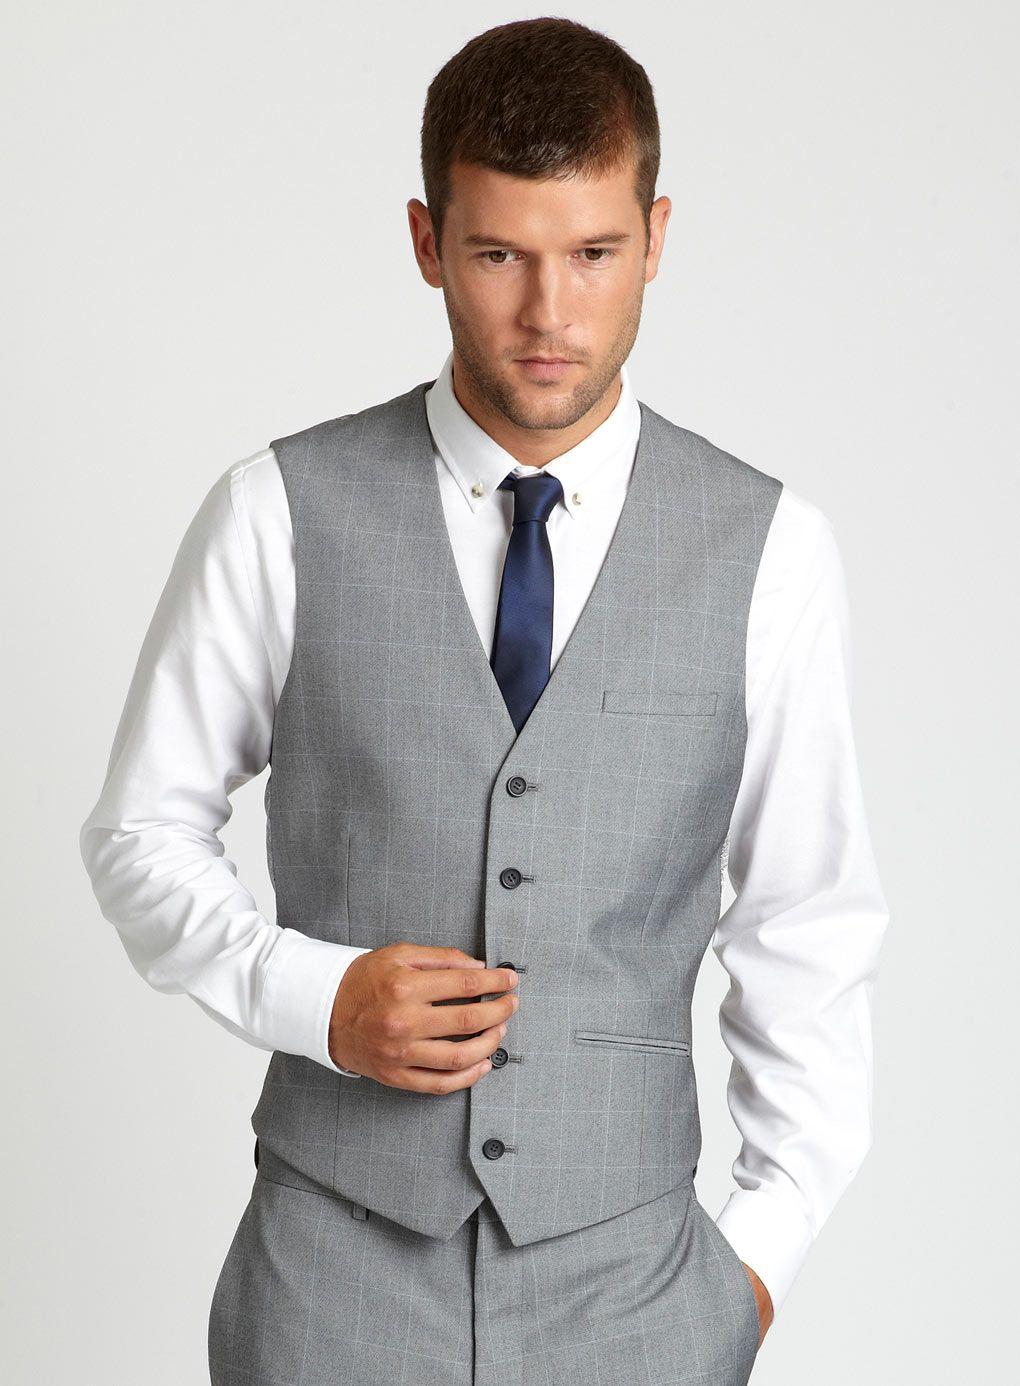 Pin By Charmain Sim On Wedding Gowns And Suits Grey Vest Groomsmen Groomsmen Attire Grey Navy Blue Tie